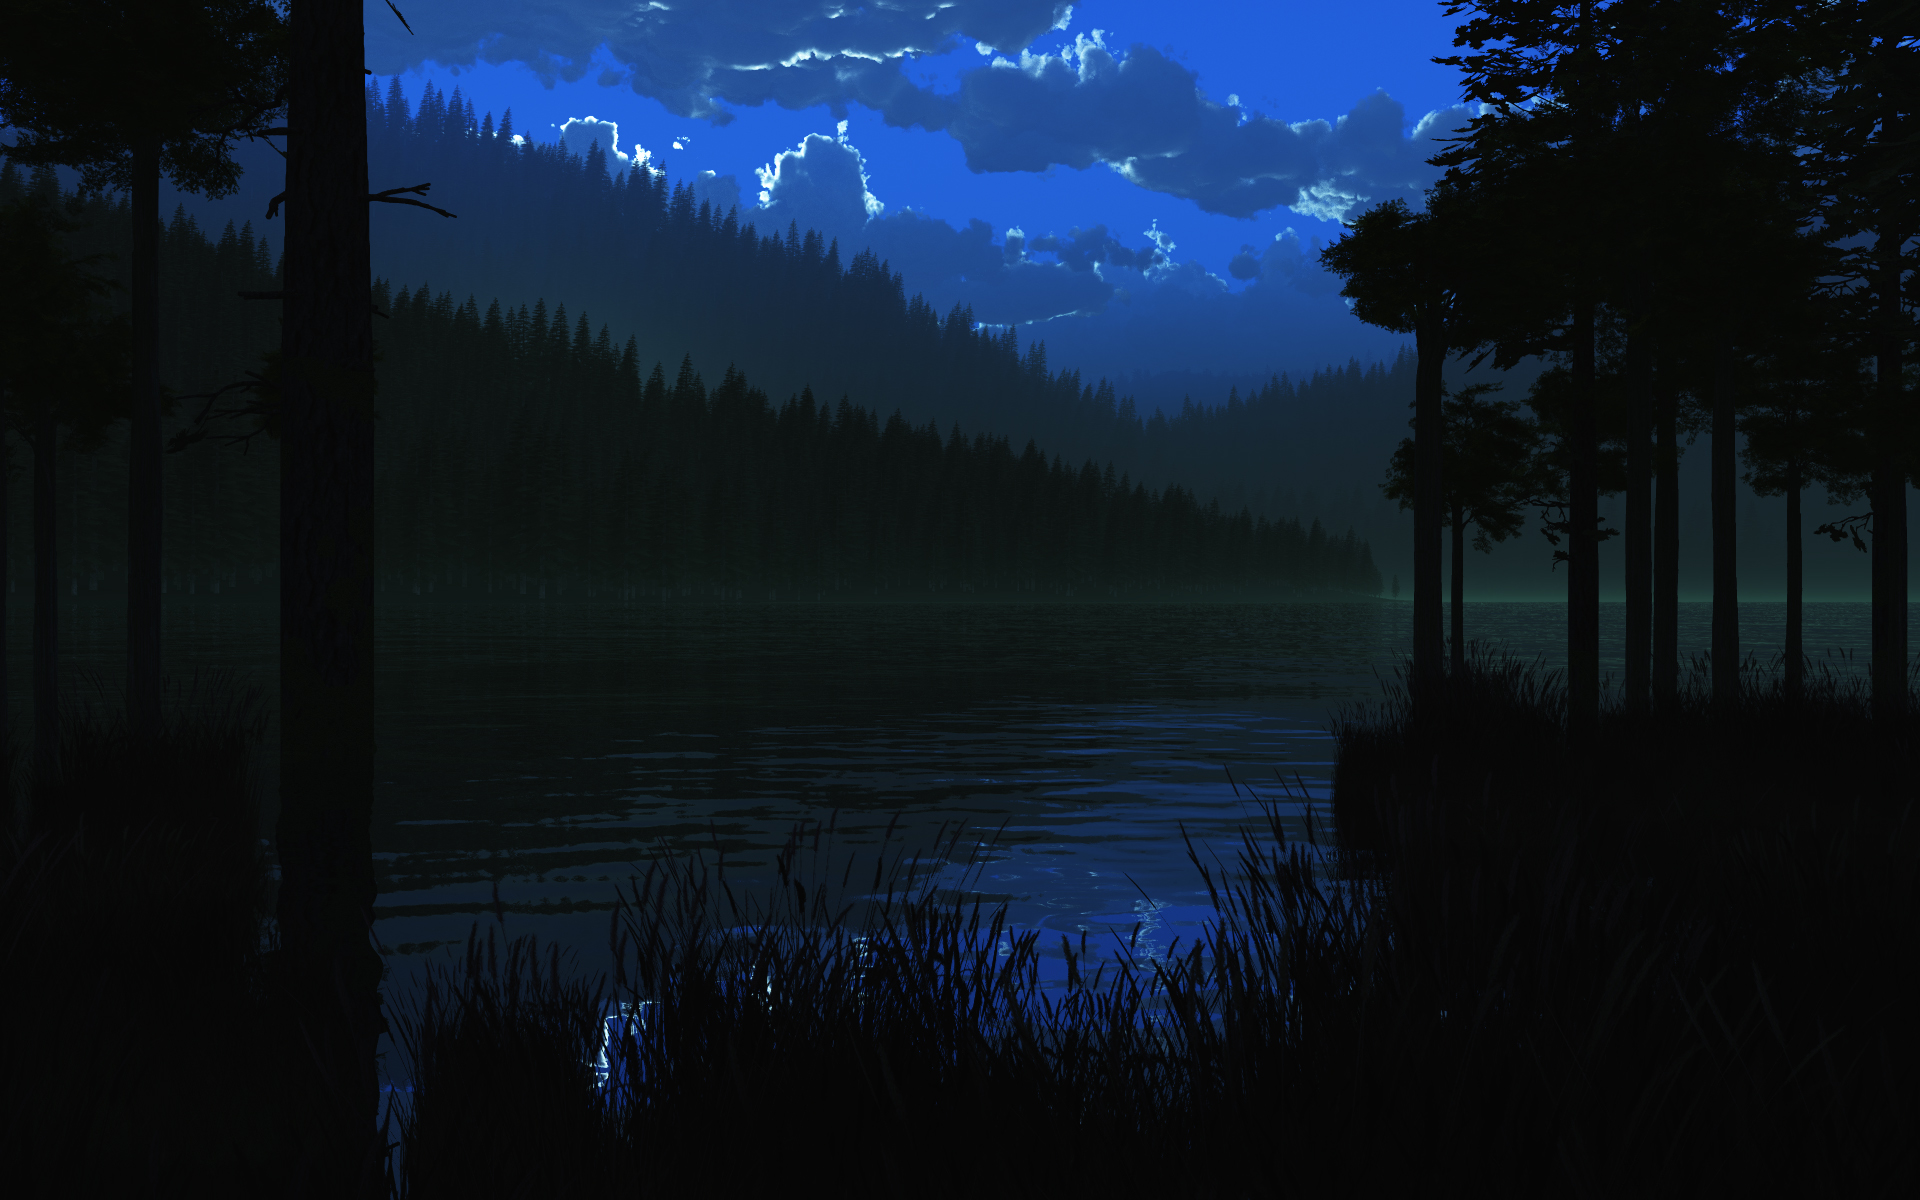 Sombre Fond d'écran HD | Arrière-Plan | 1920x1200 | ID:375555 - Wallpaper Abyss